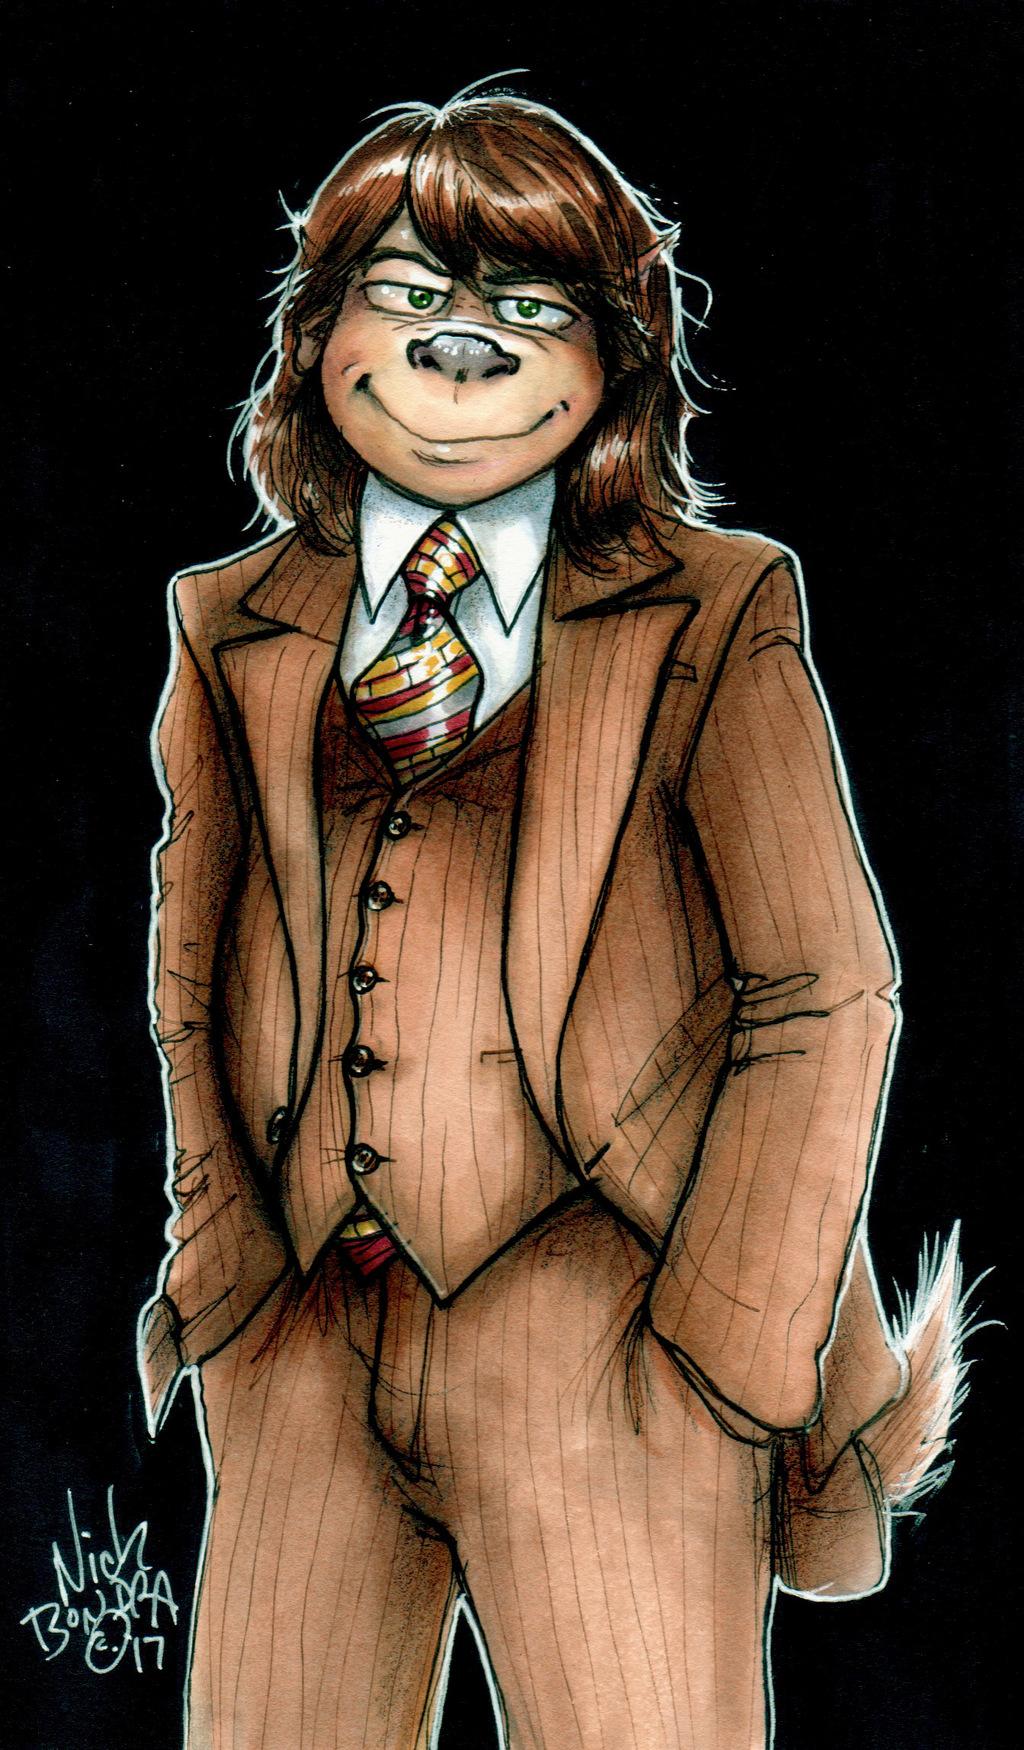 Brown Suits Him